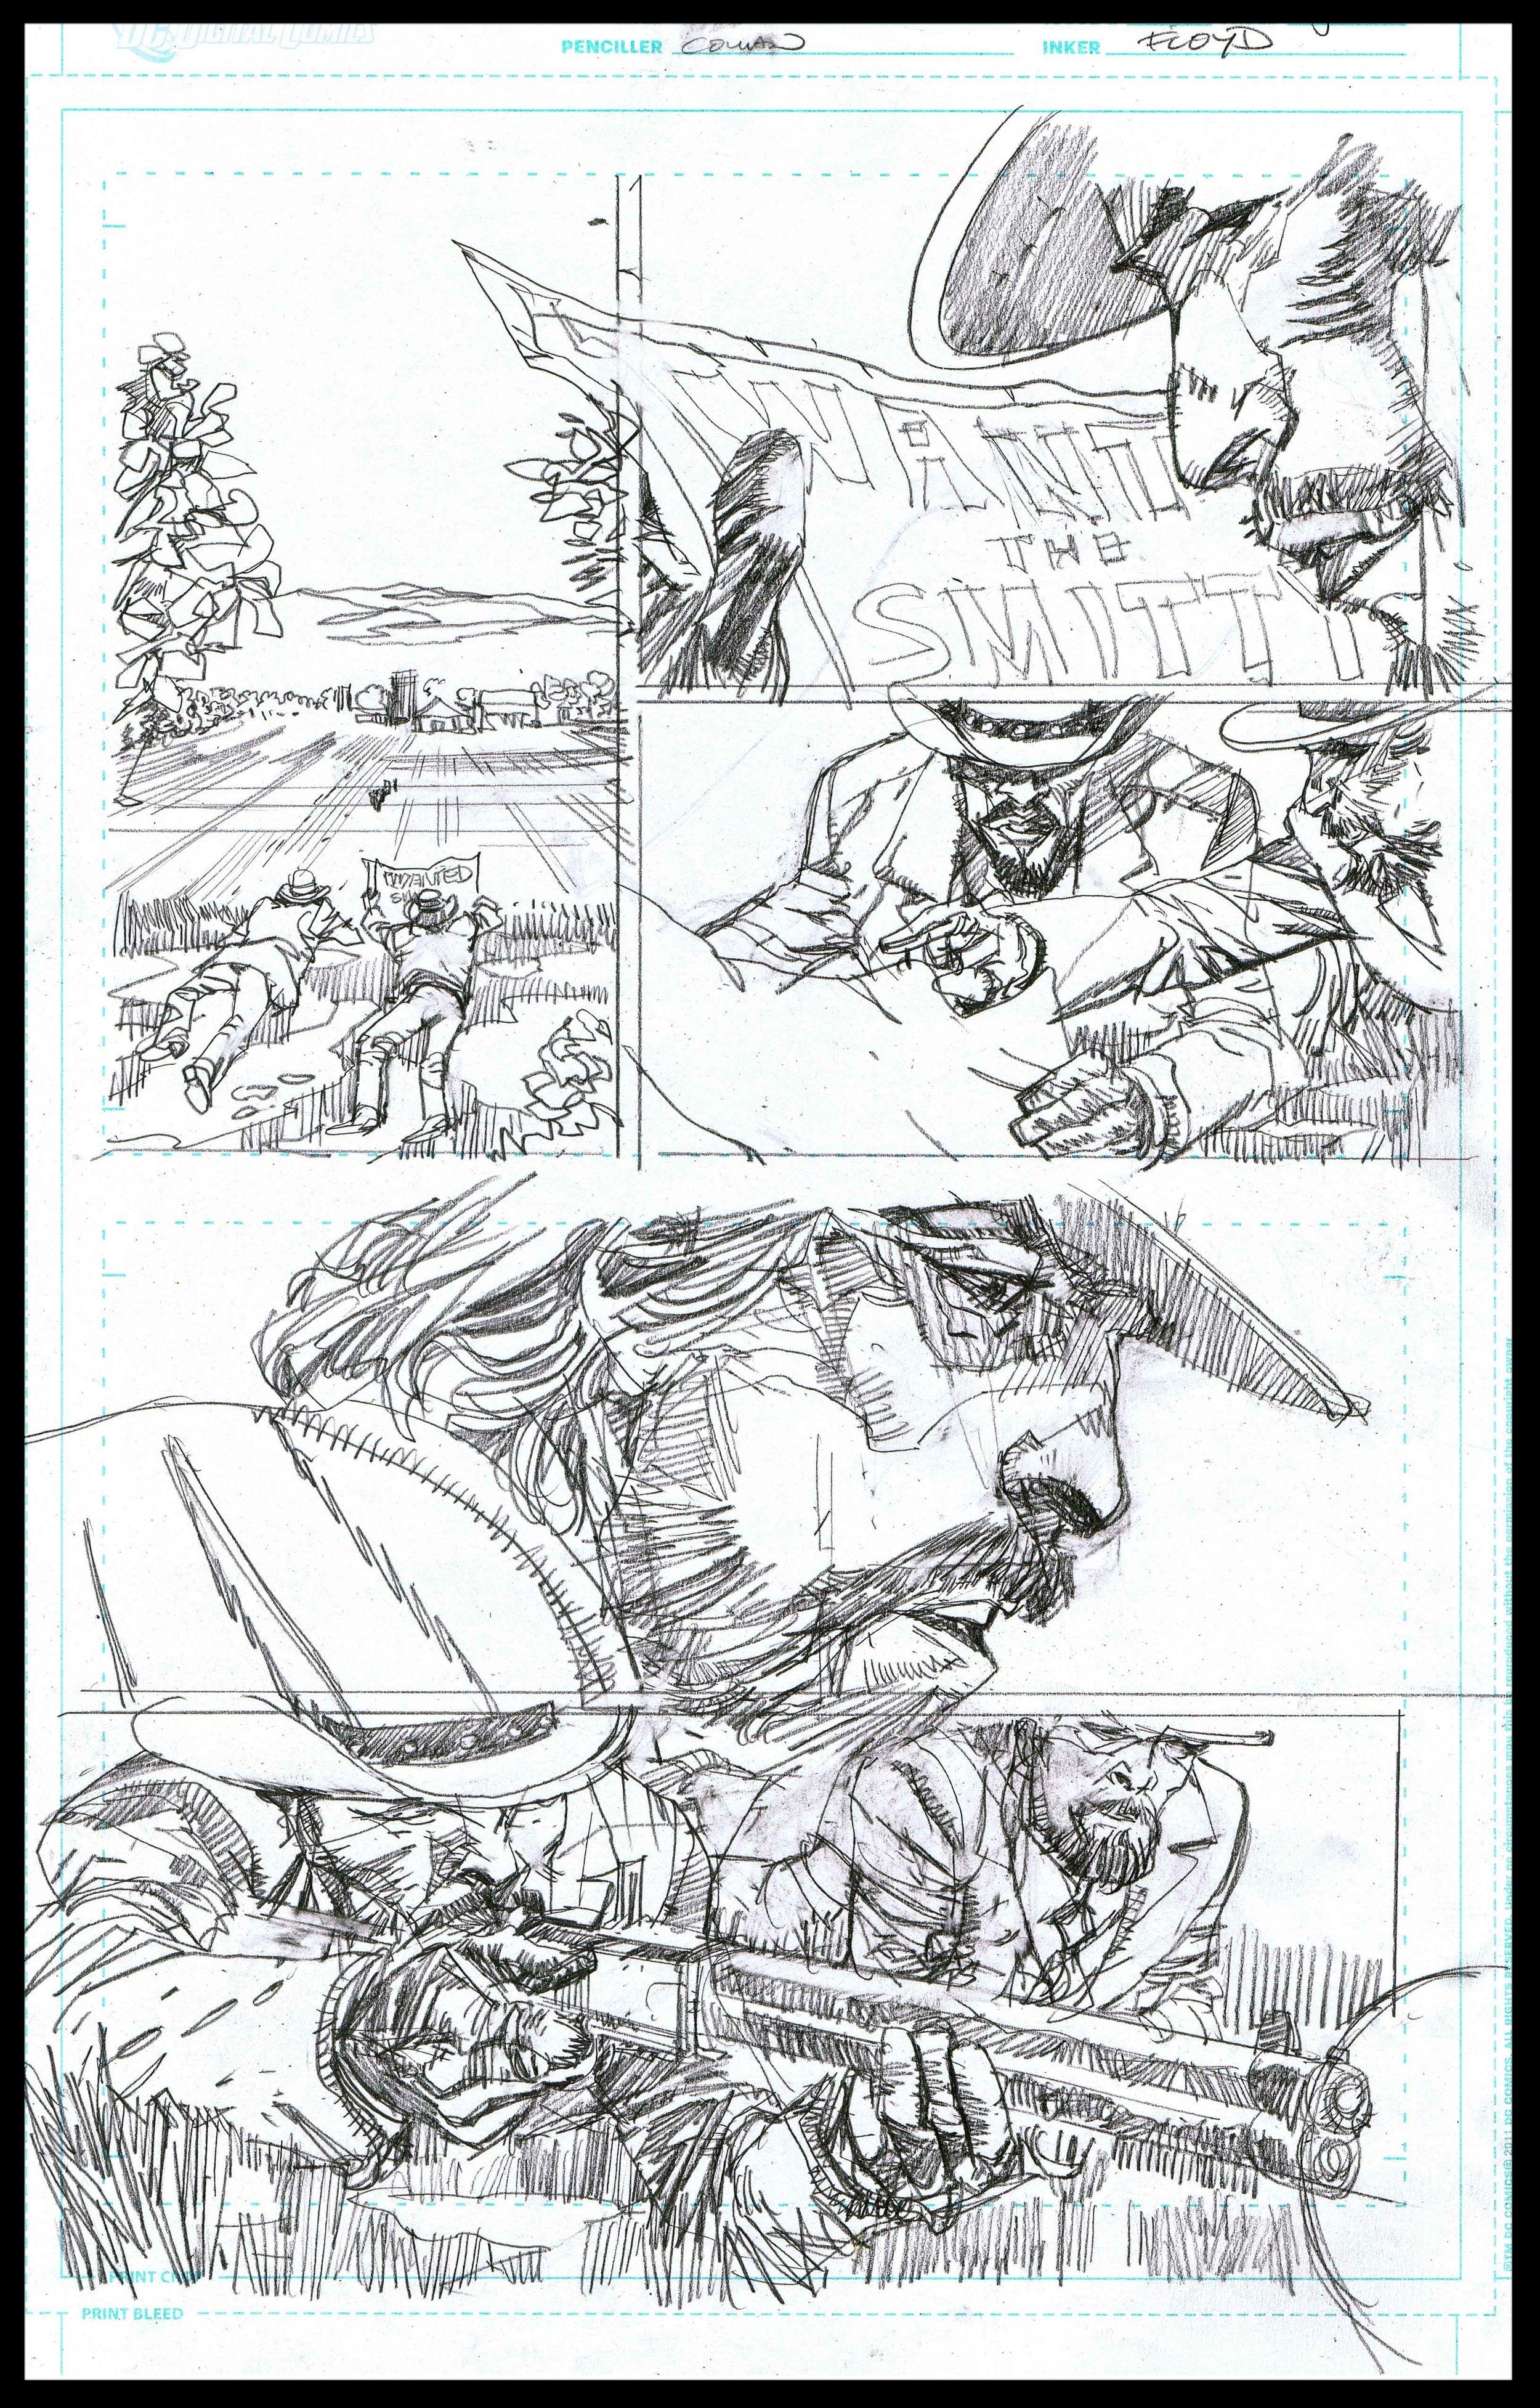 Django Unchained #3 - Page 5 - Pencils